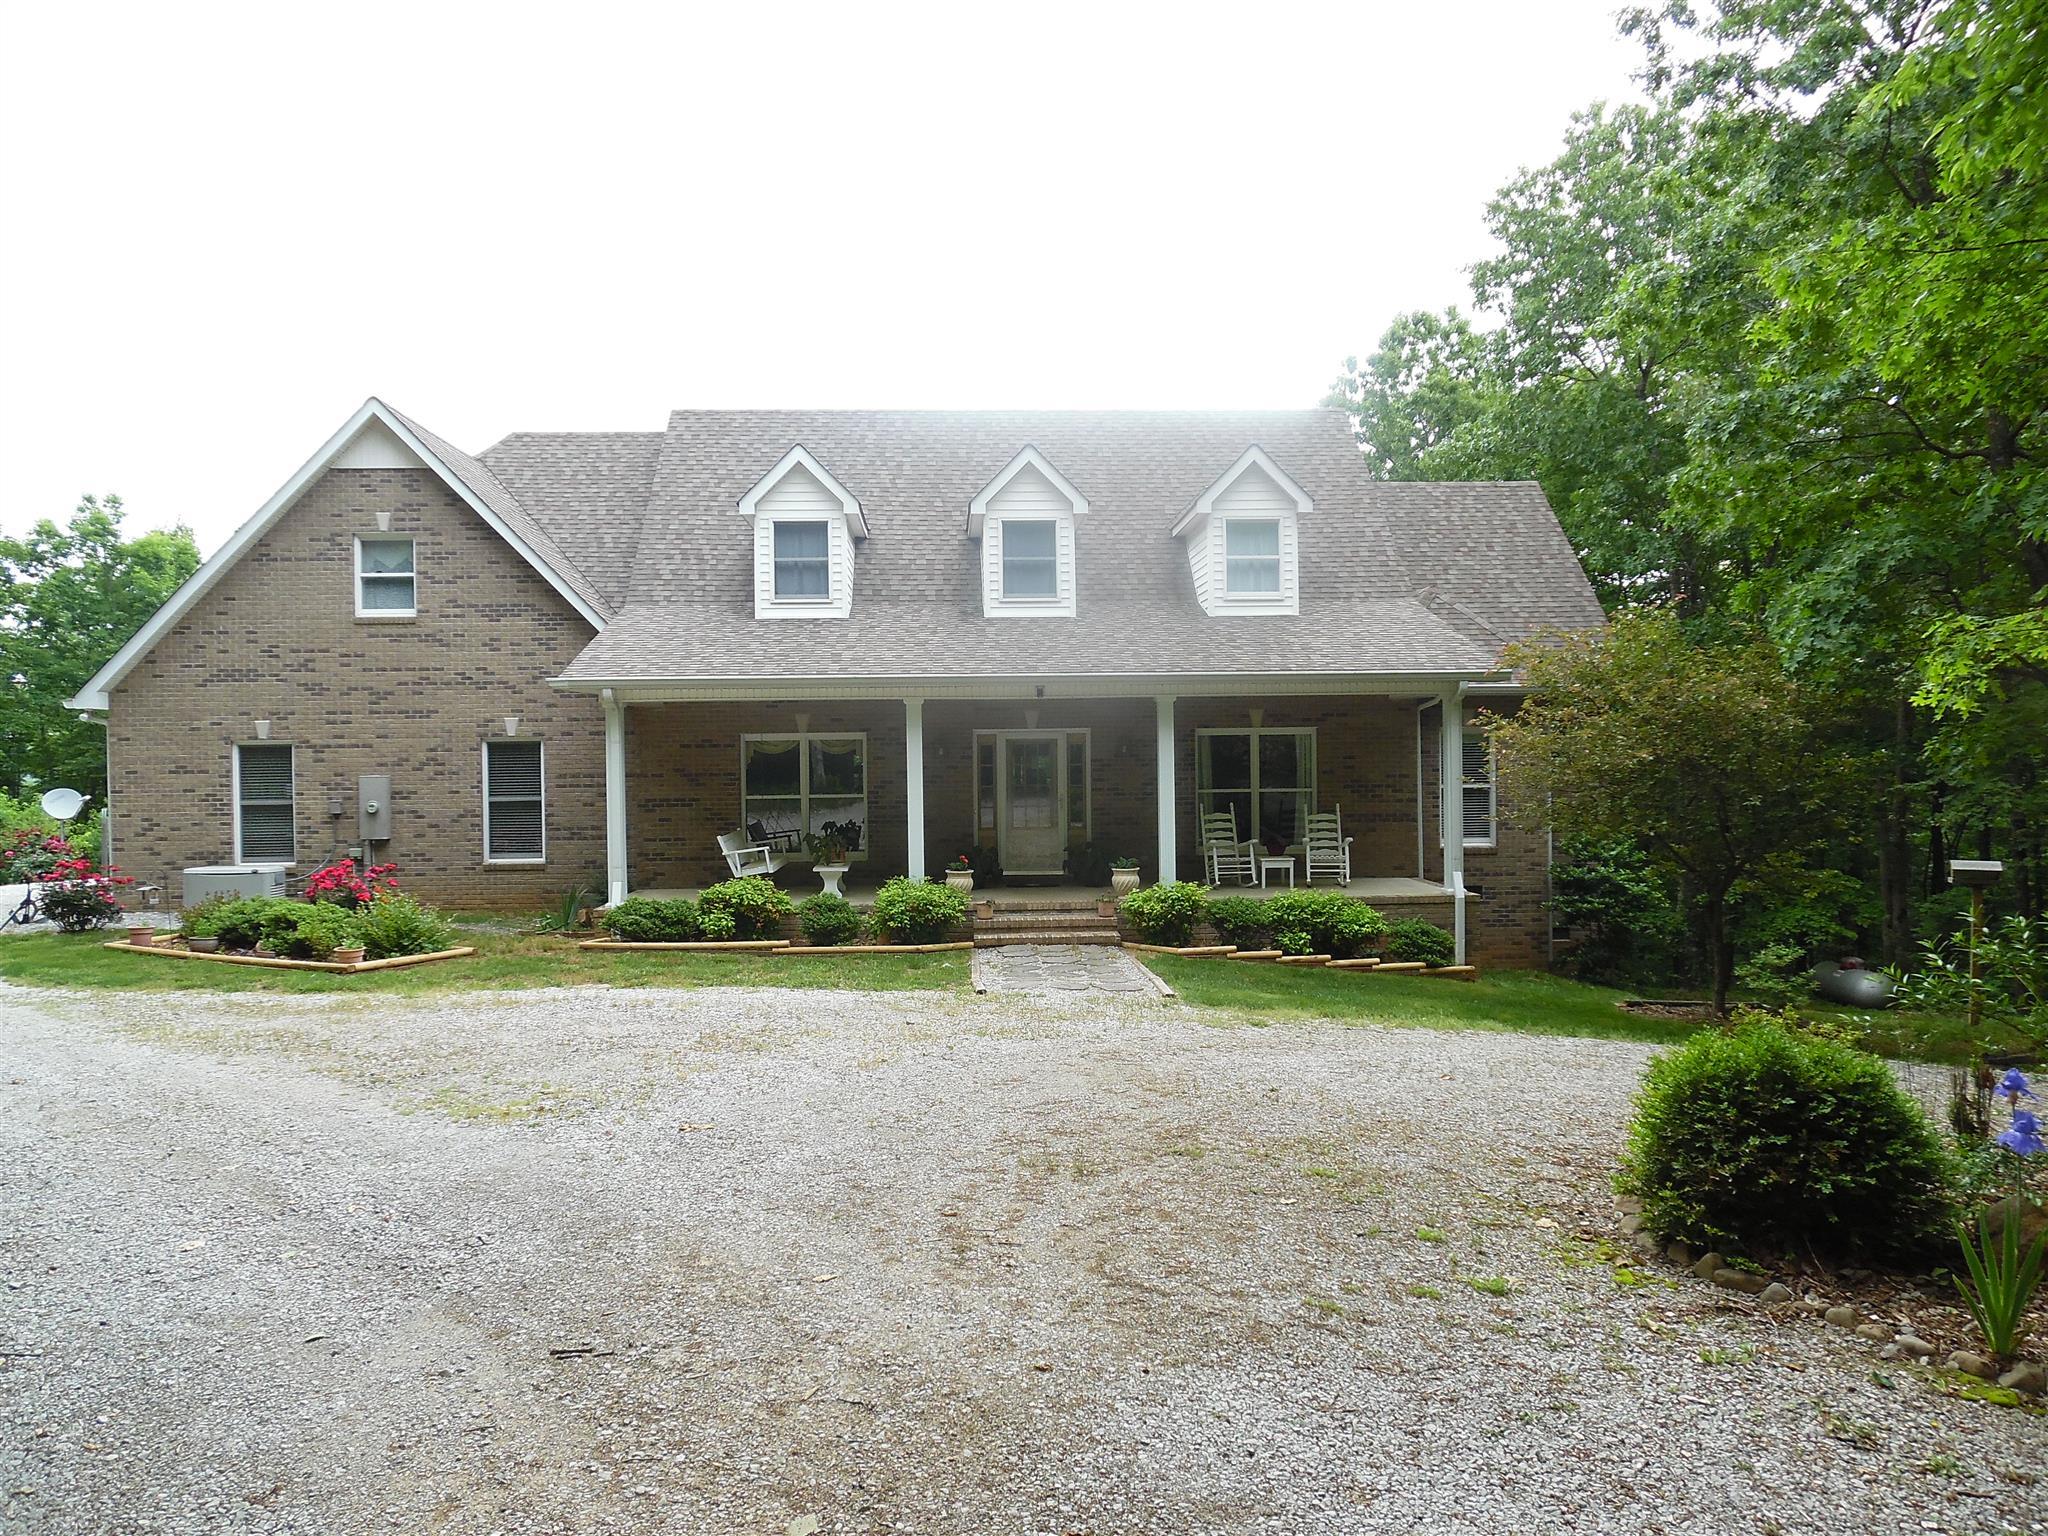 Real Estate for Sale, ListingId: 36222377, Belvidere,TN37306